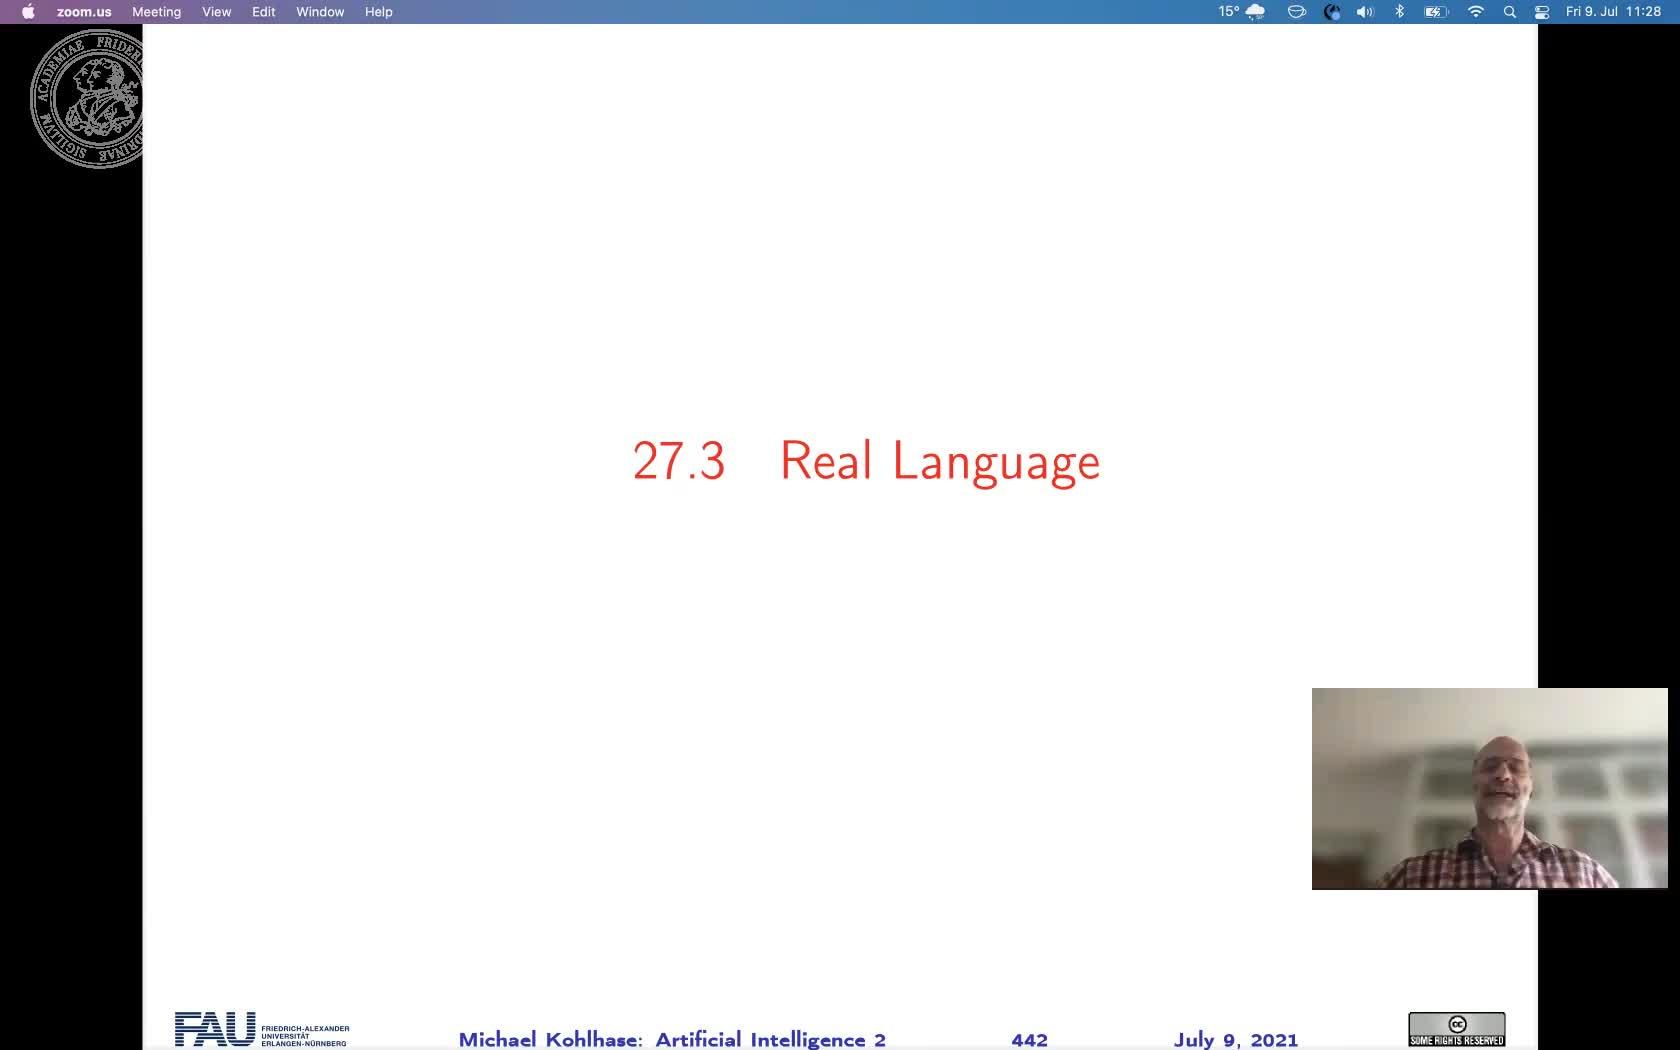 30.3 Real Language Phenomena preview image